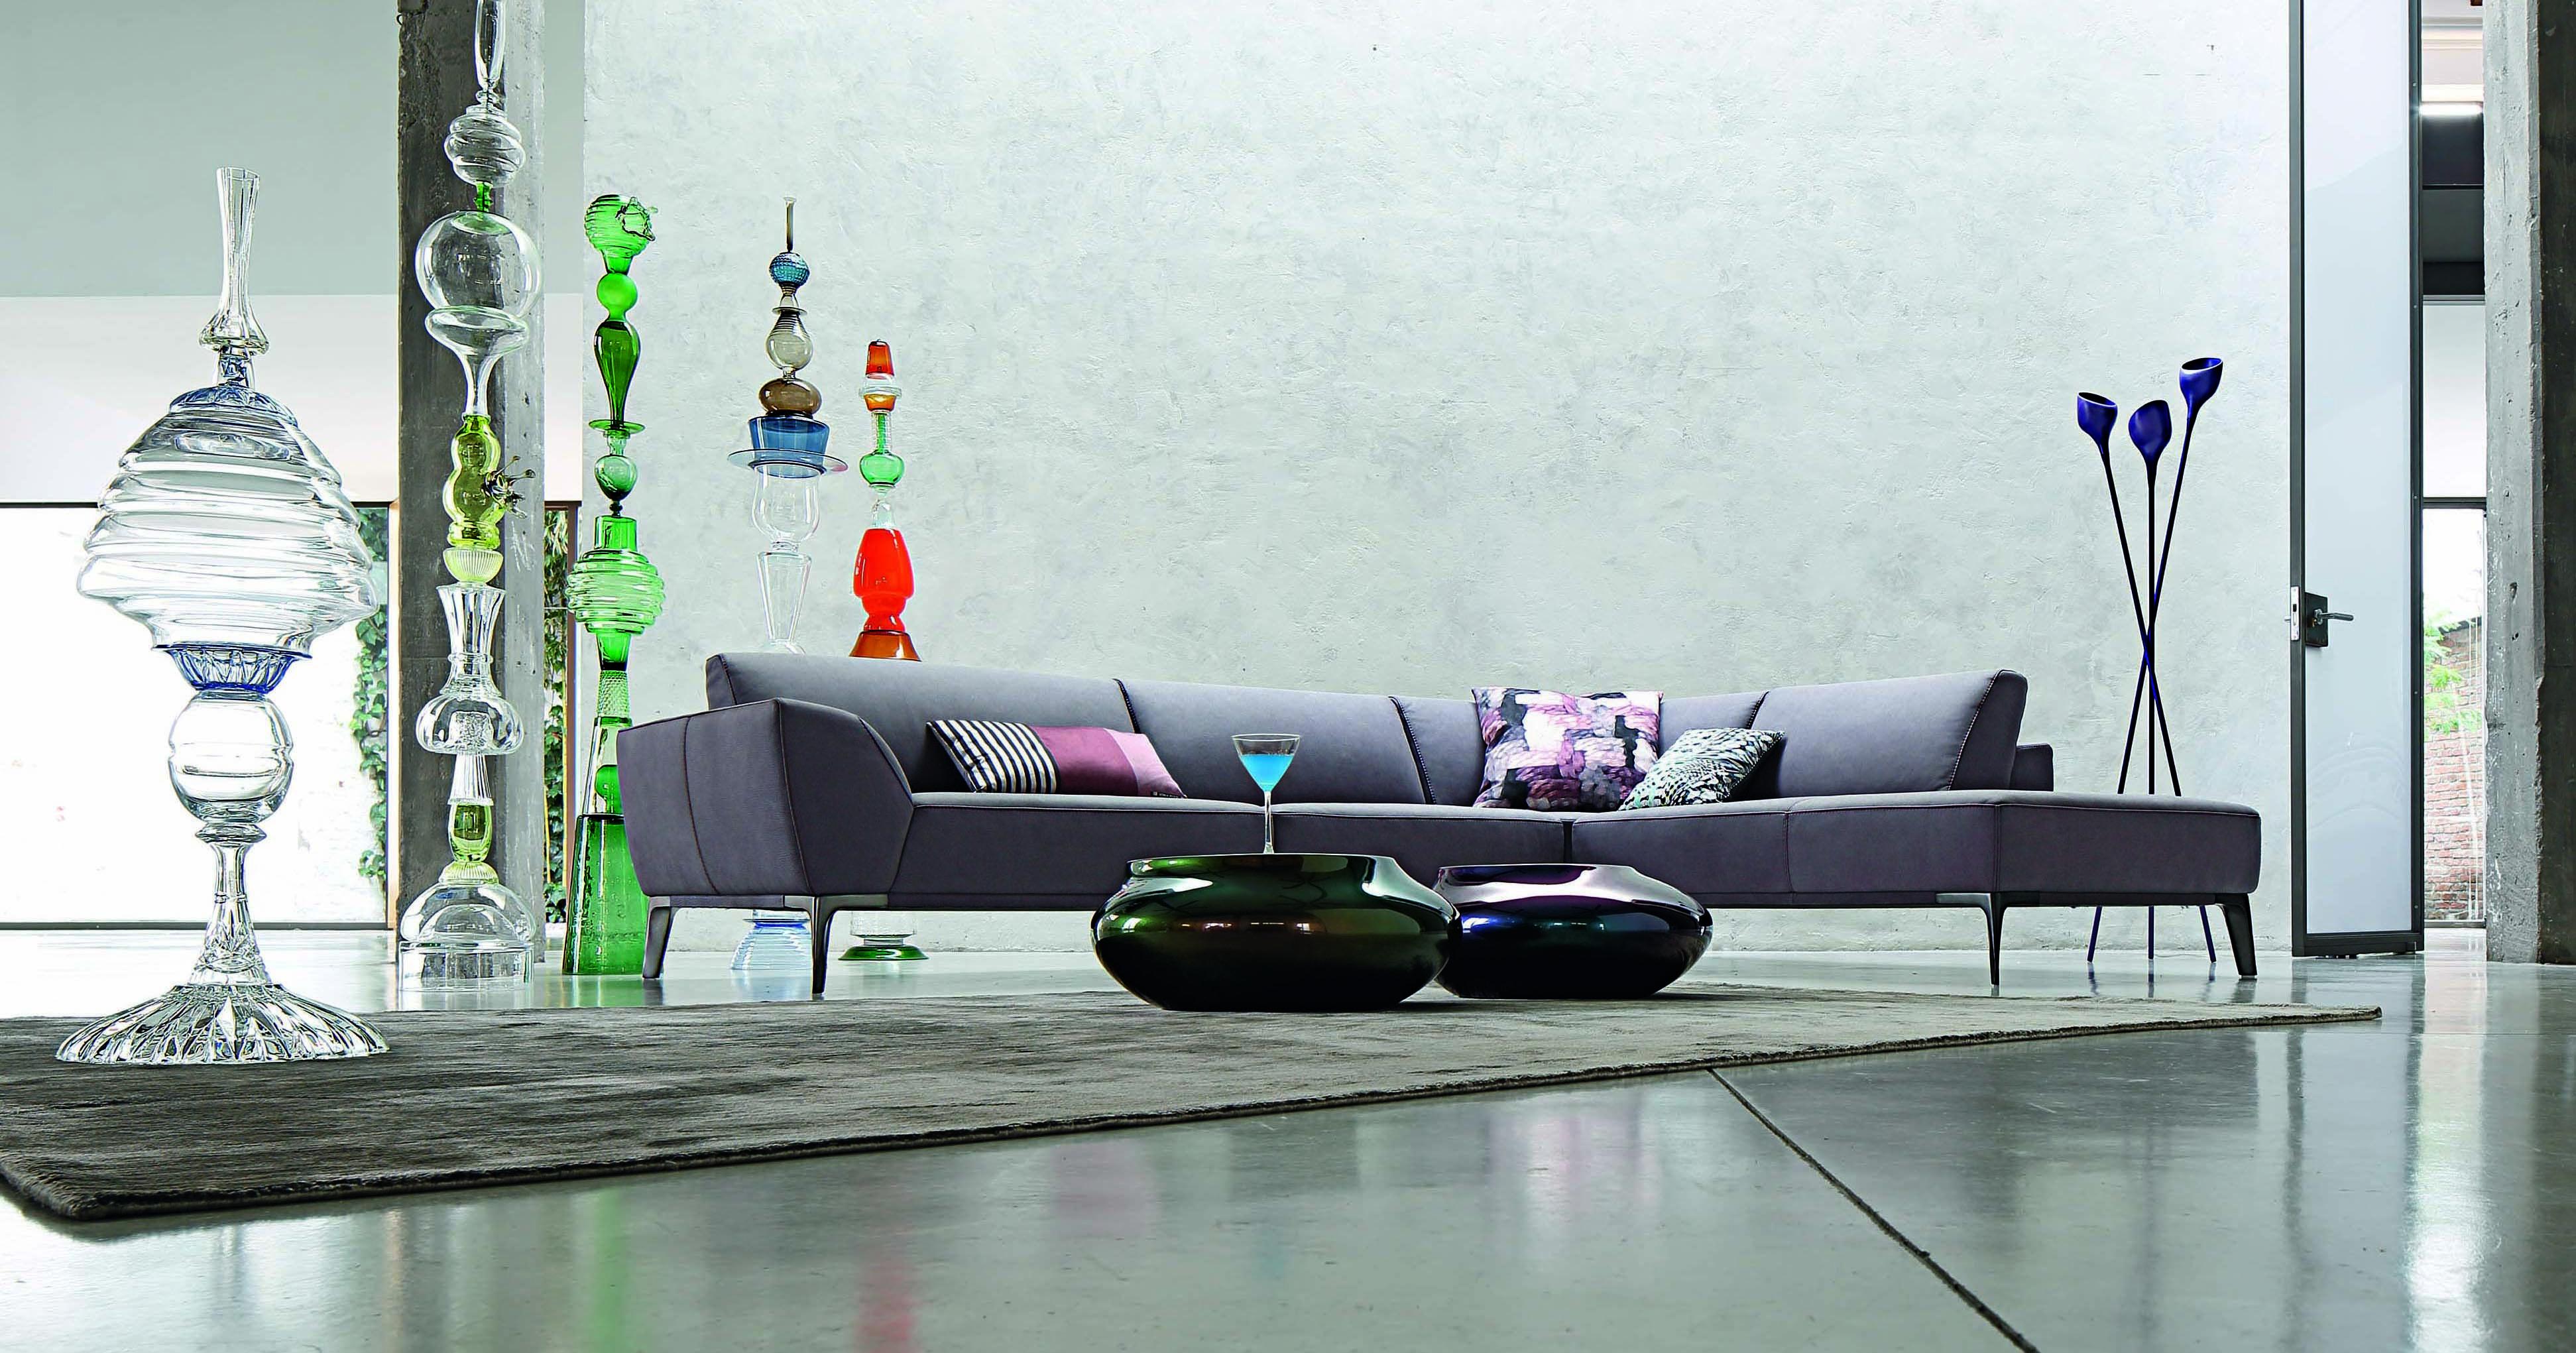 Roche Bobois Meteore Leather Modular Sectional Sofa Design Sacha Lakic Rochebobois Leather Sofa C Luxury Sofa Design Furniture Choice Elegant Interiors